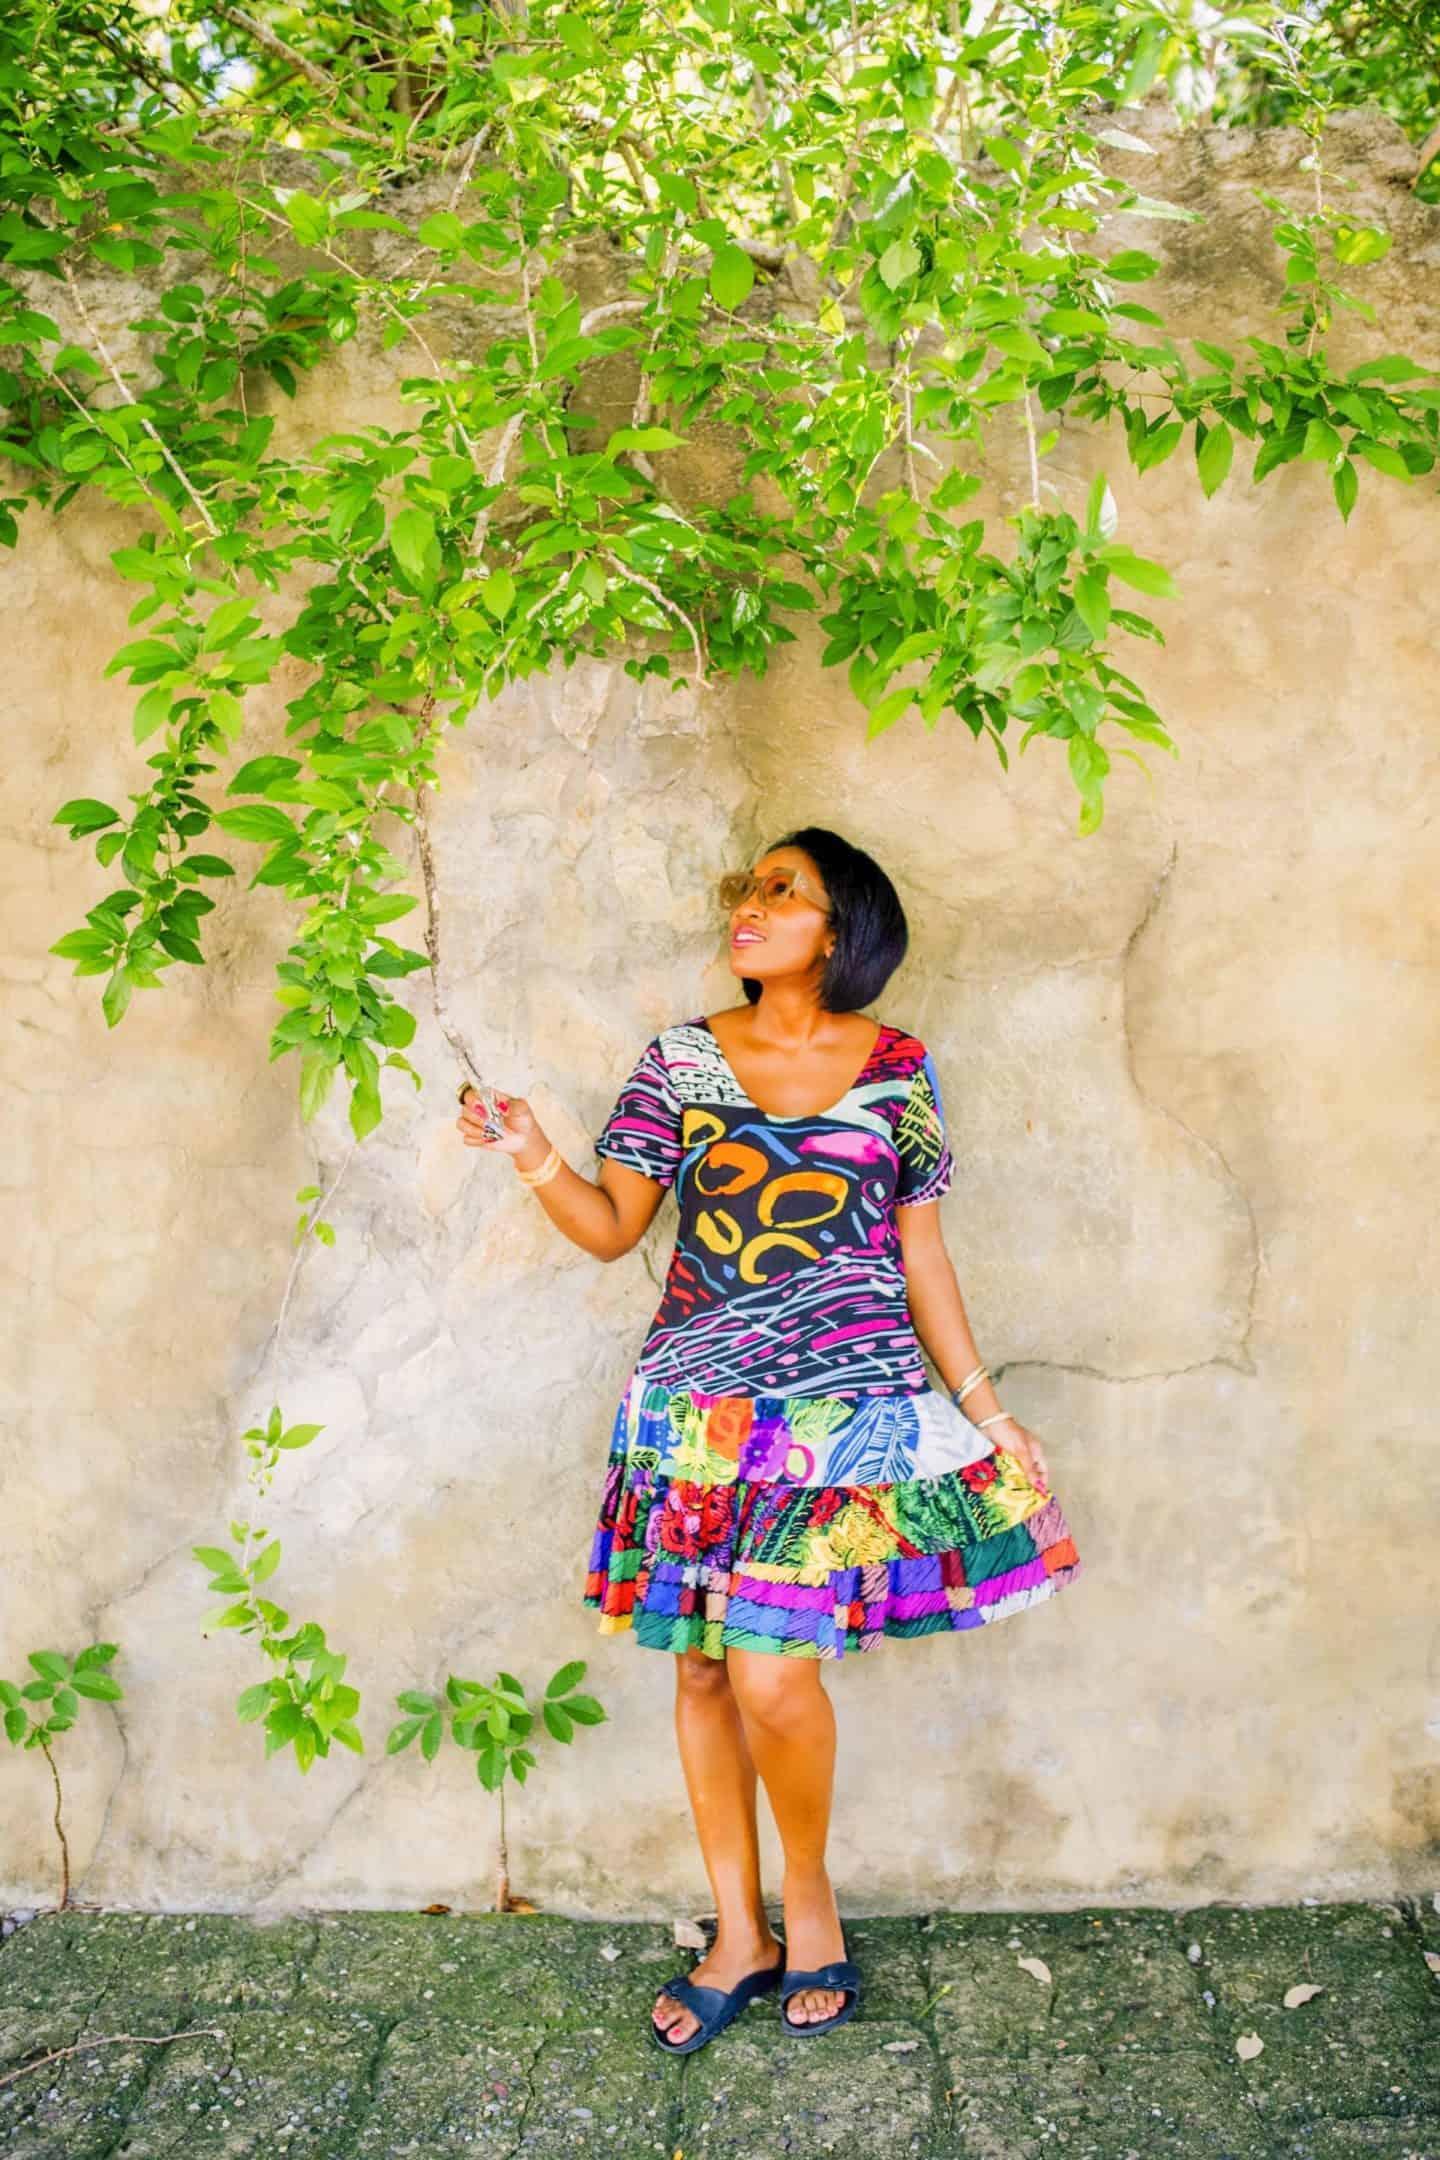 Shaunda Necole- Gumbalimba Park wildlife preservation tour - Carnival Vista - Choose Fun!